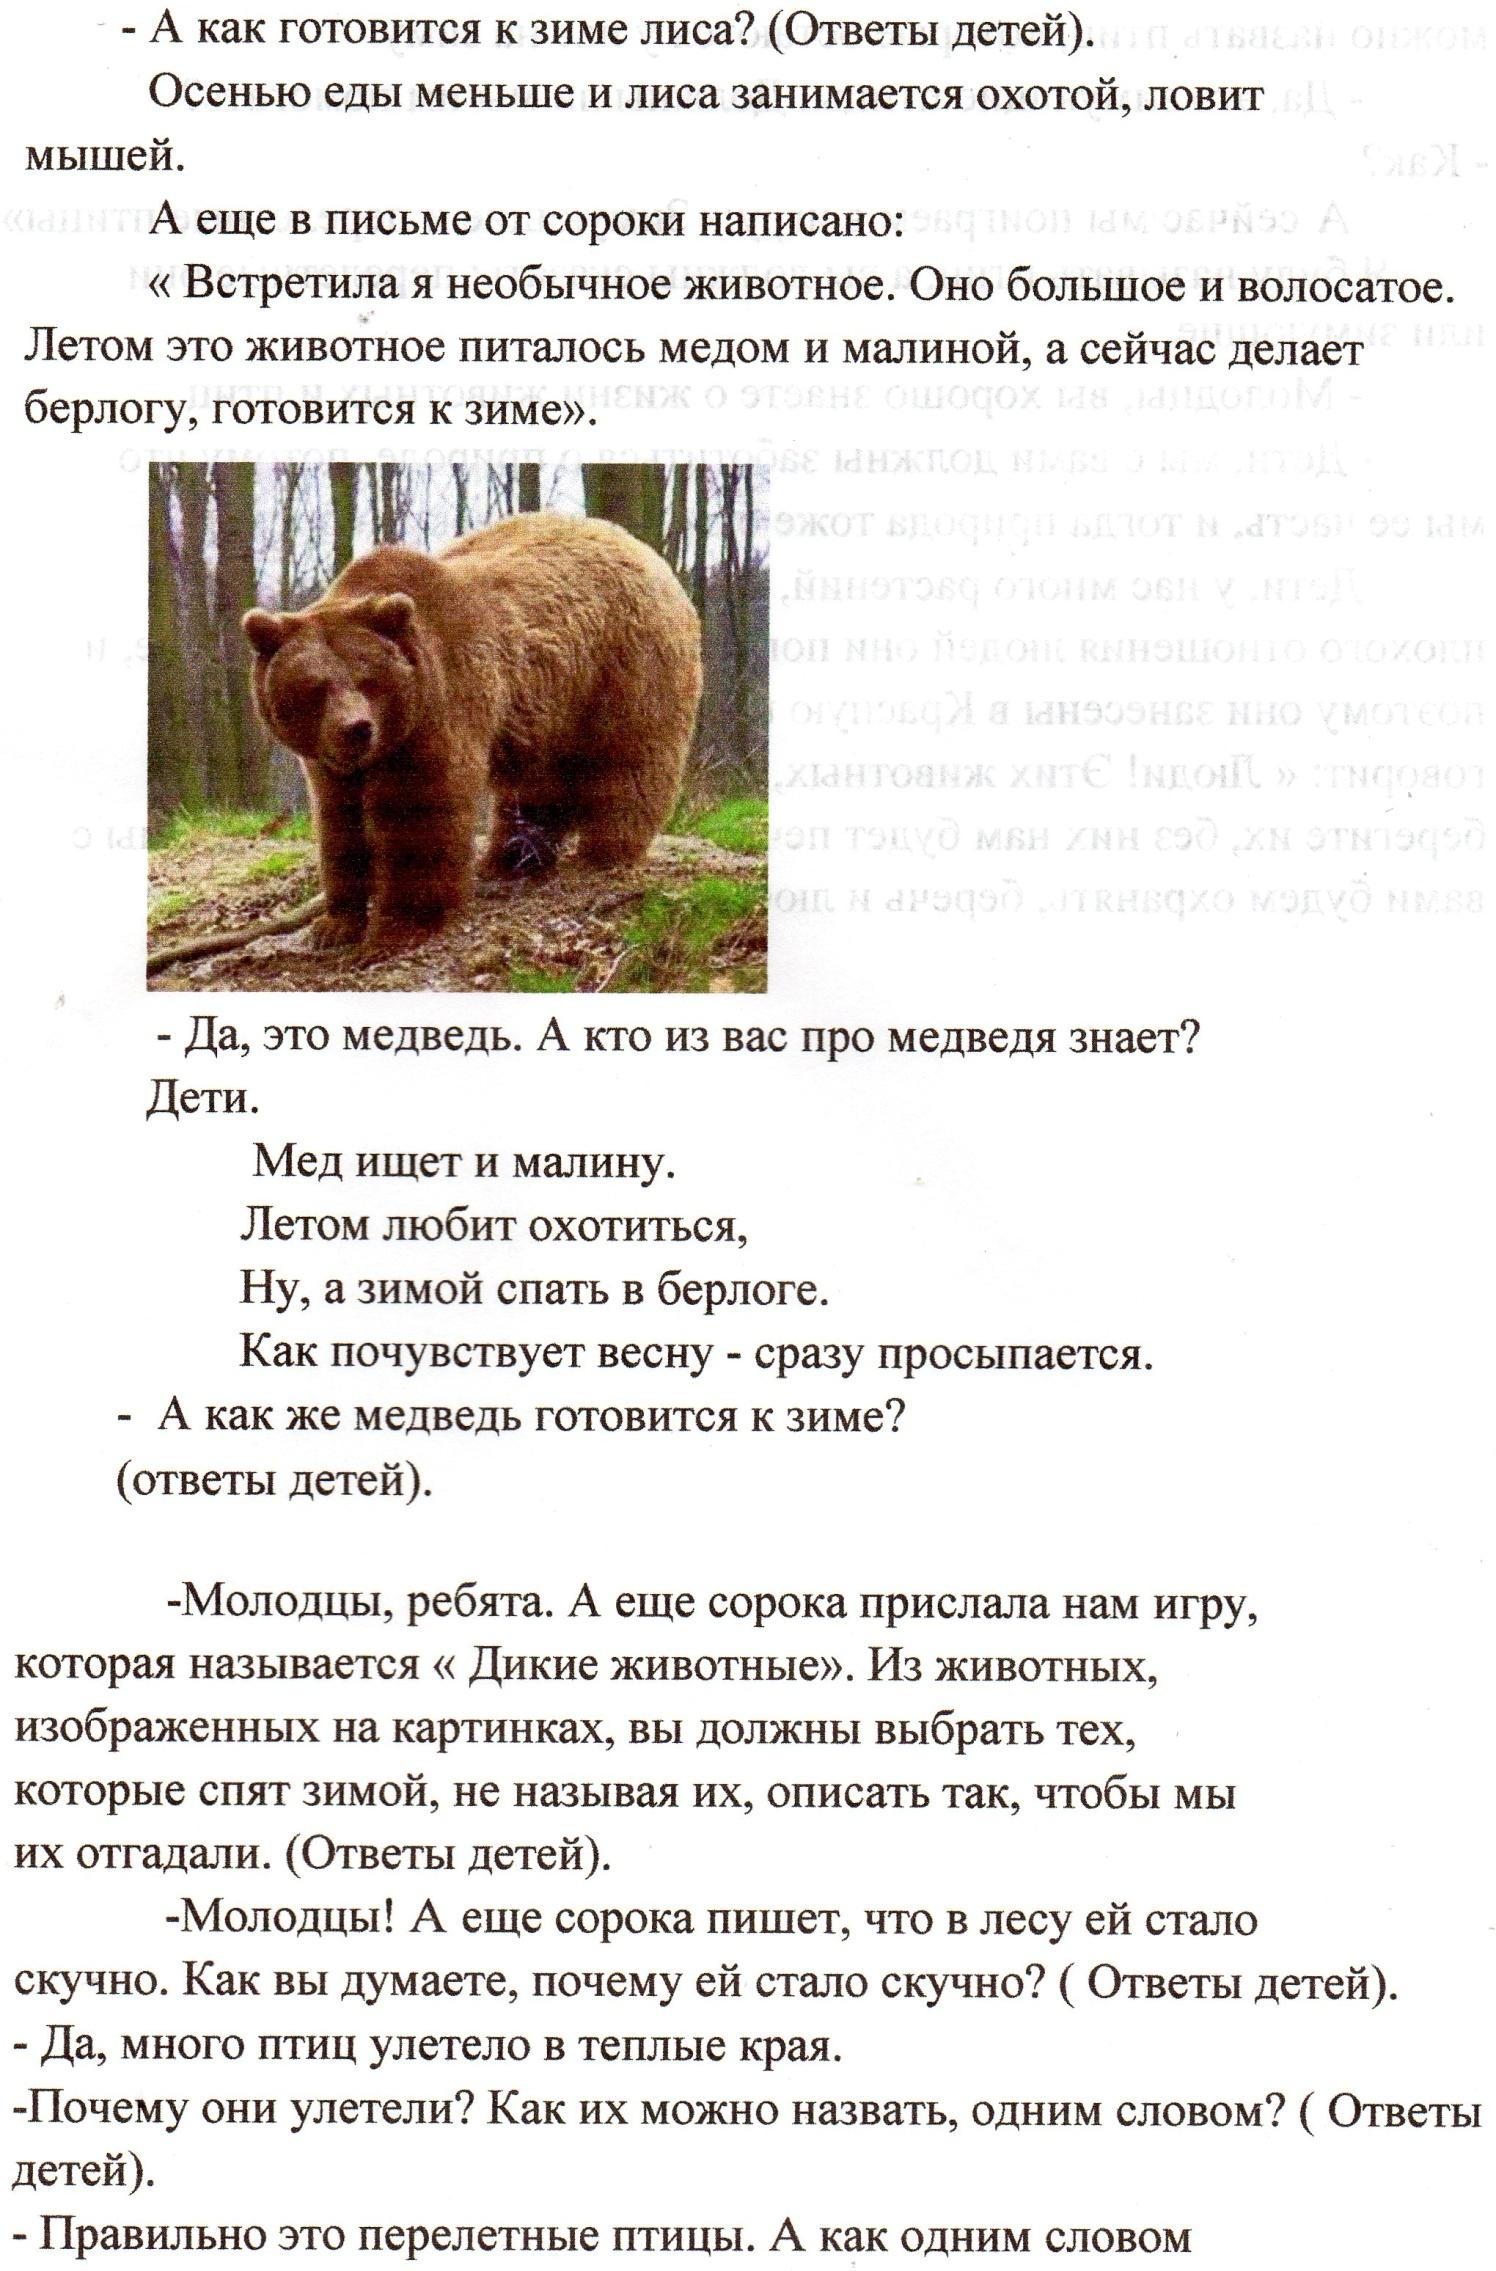 C:\Users\Александр\Pictures\img020.jpg